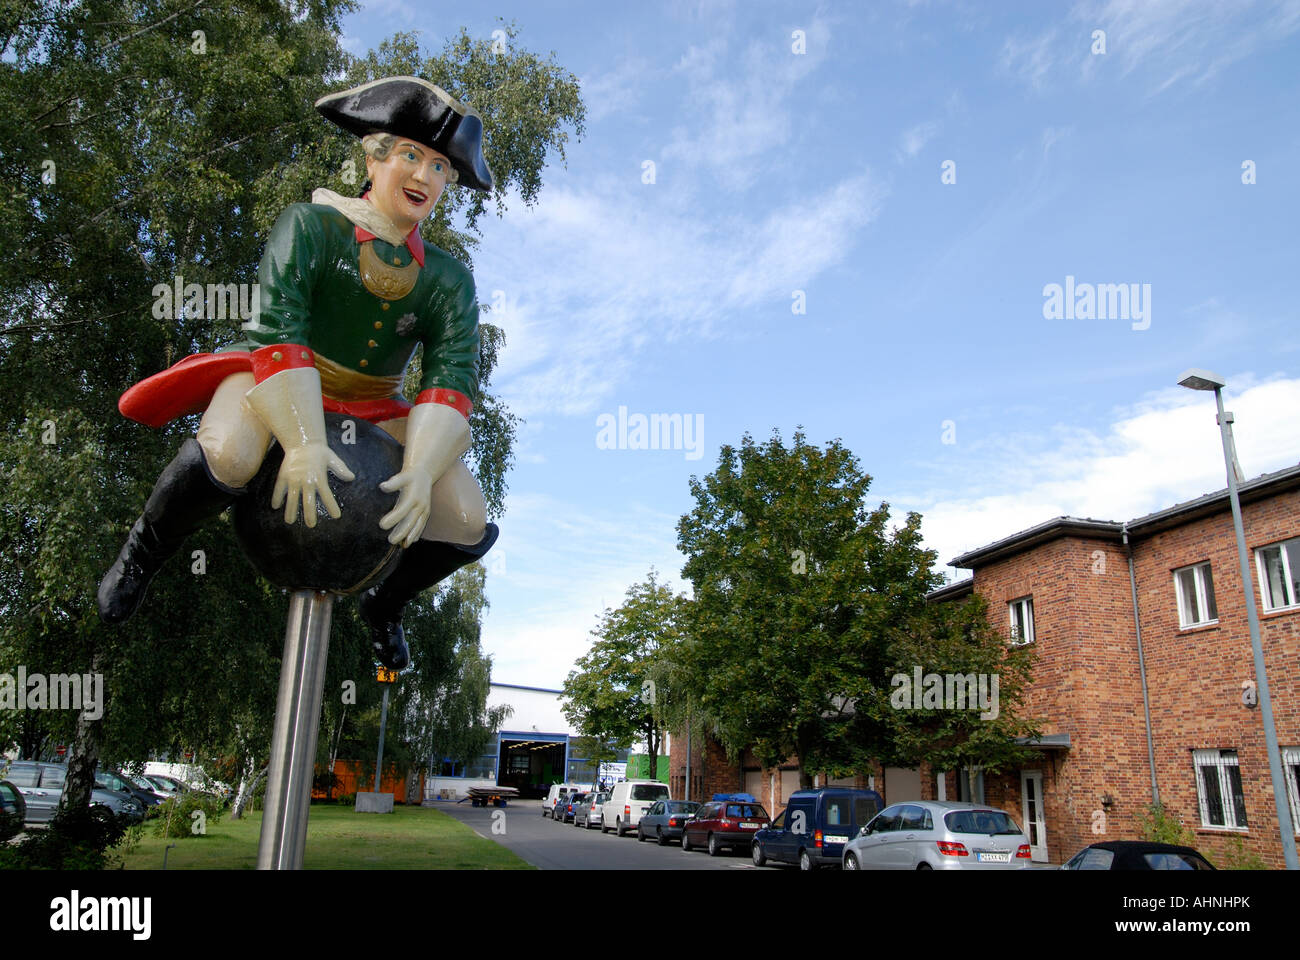 Estatua del Barón Munchhausen en Studio Babelsberg de Potsdam, Alemania Foto de stock